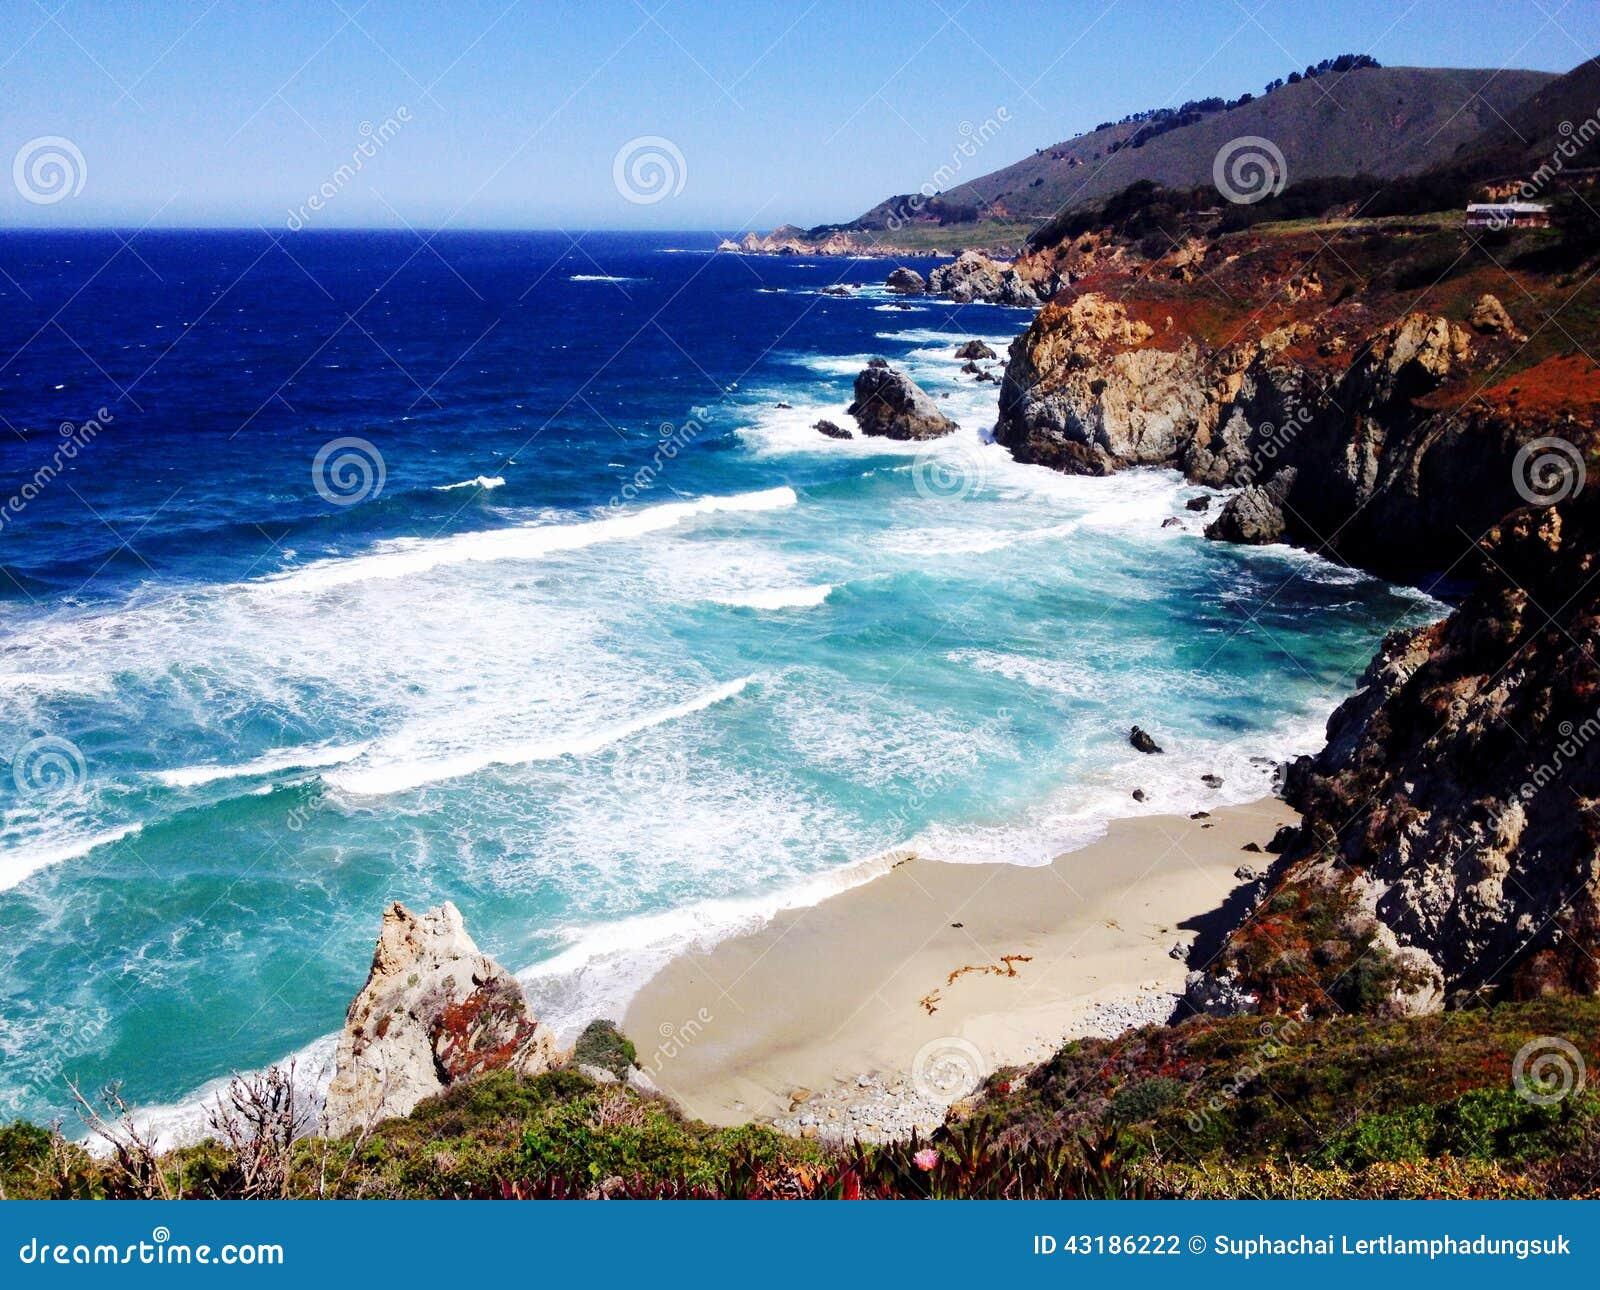 Topic has Beautiful ocean views beaches think